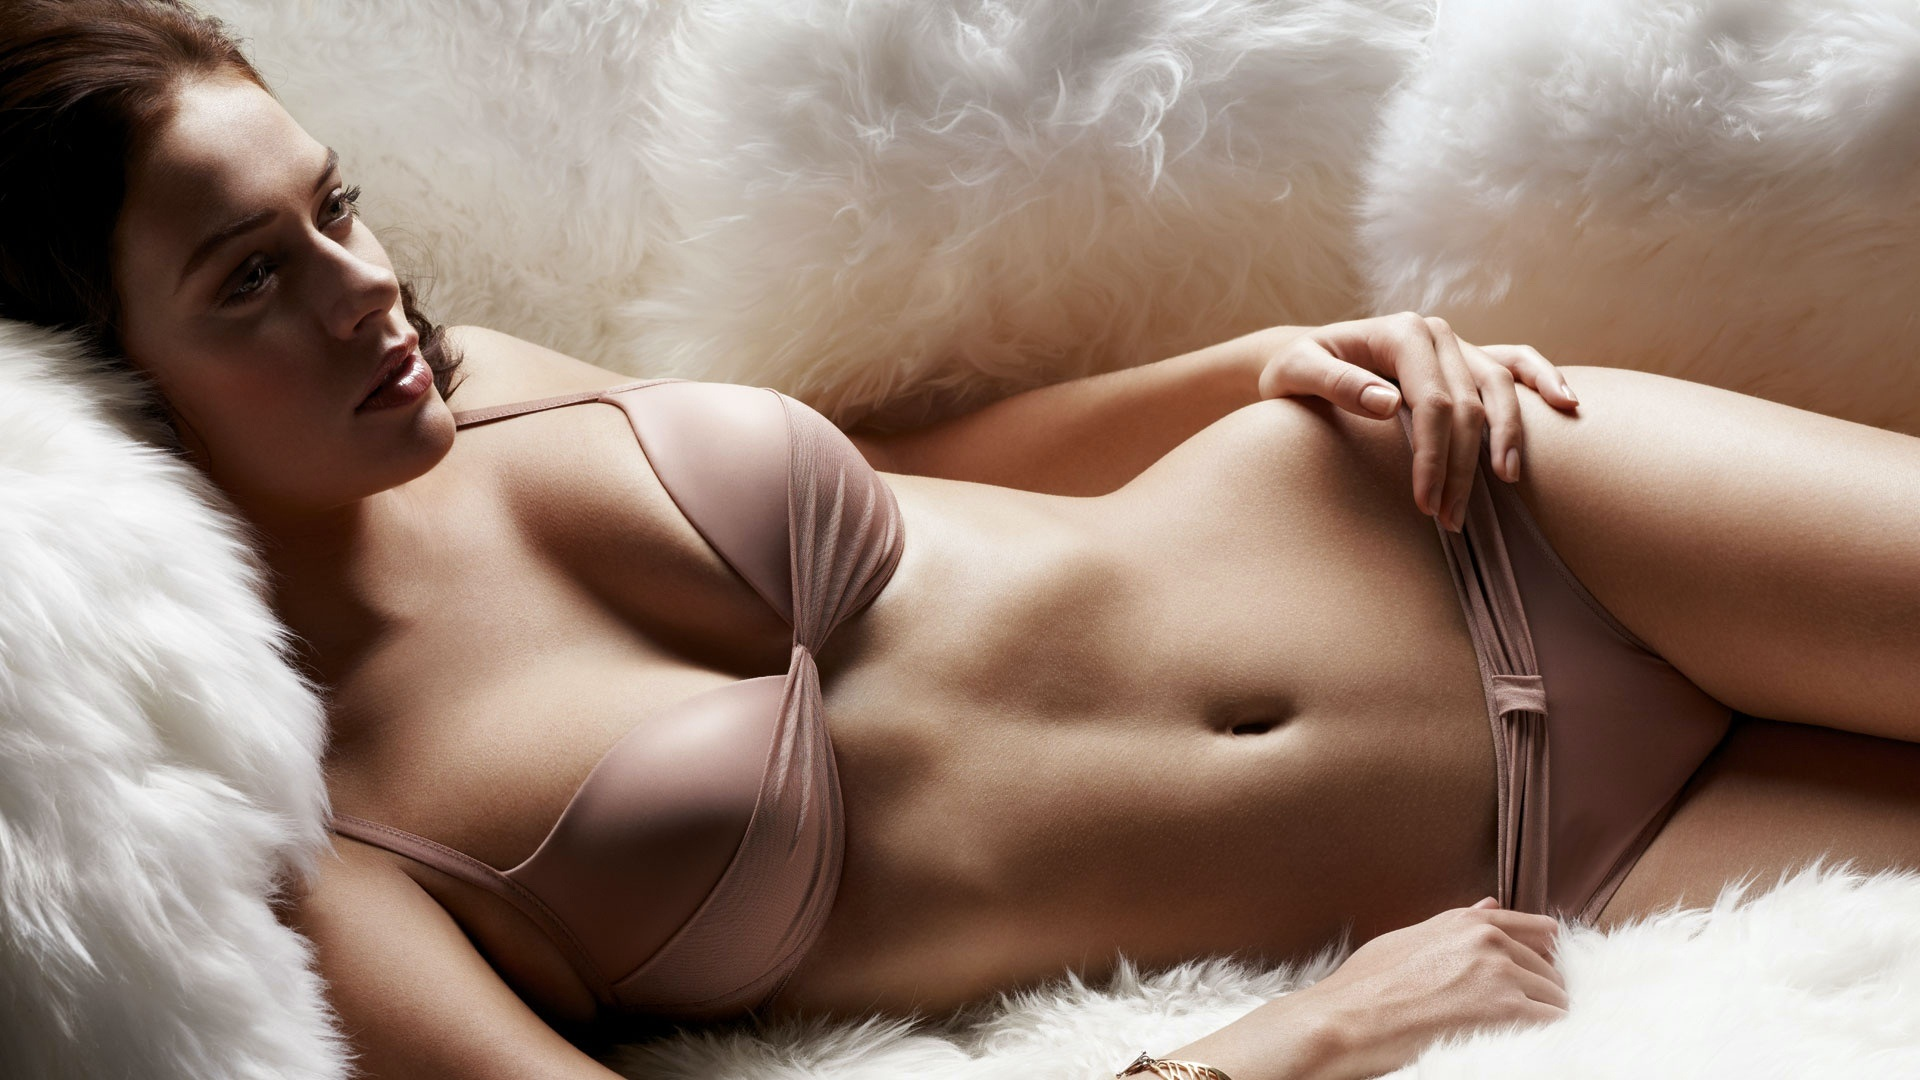 melayu-nud-and-sex-hd-girls-first